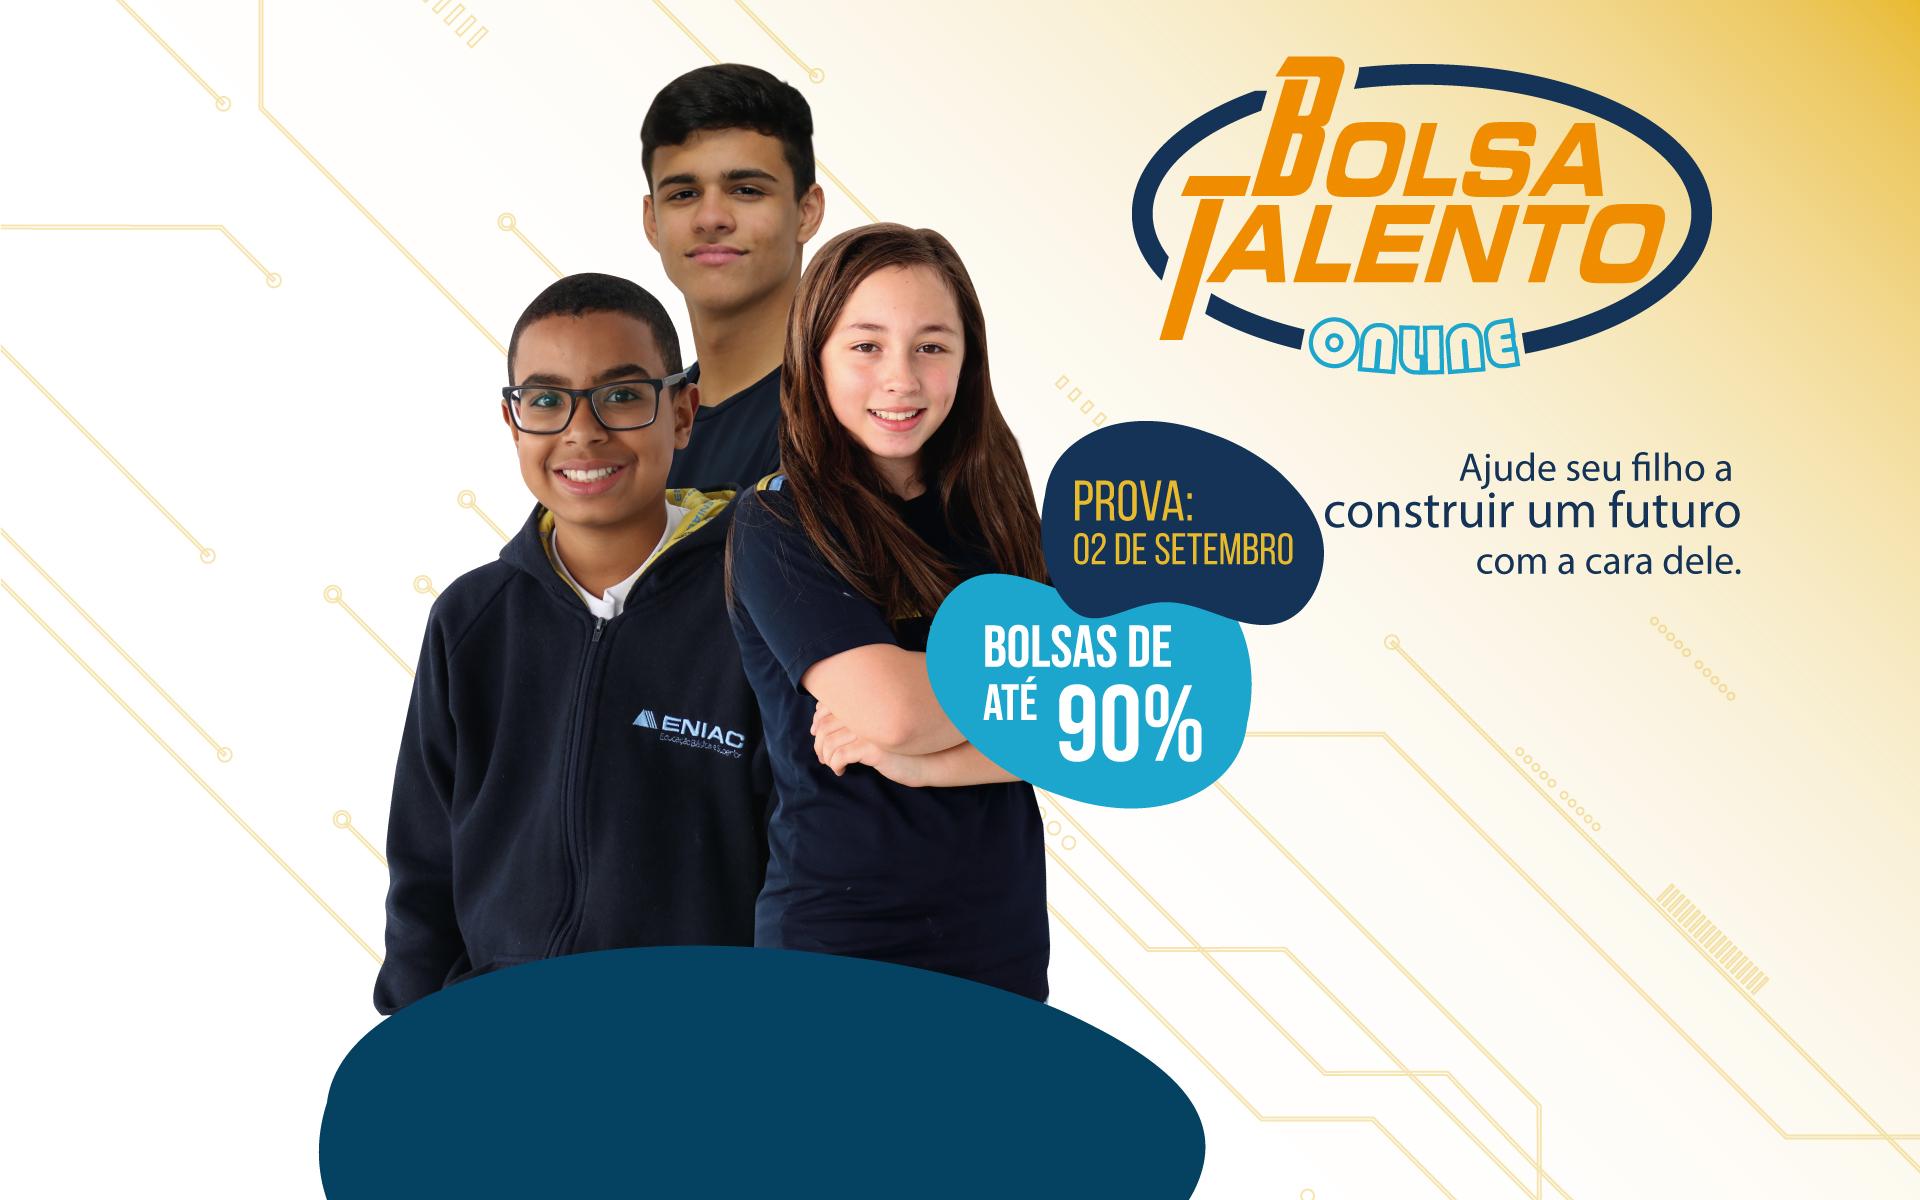 bolsa_talento_2020-web